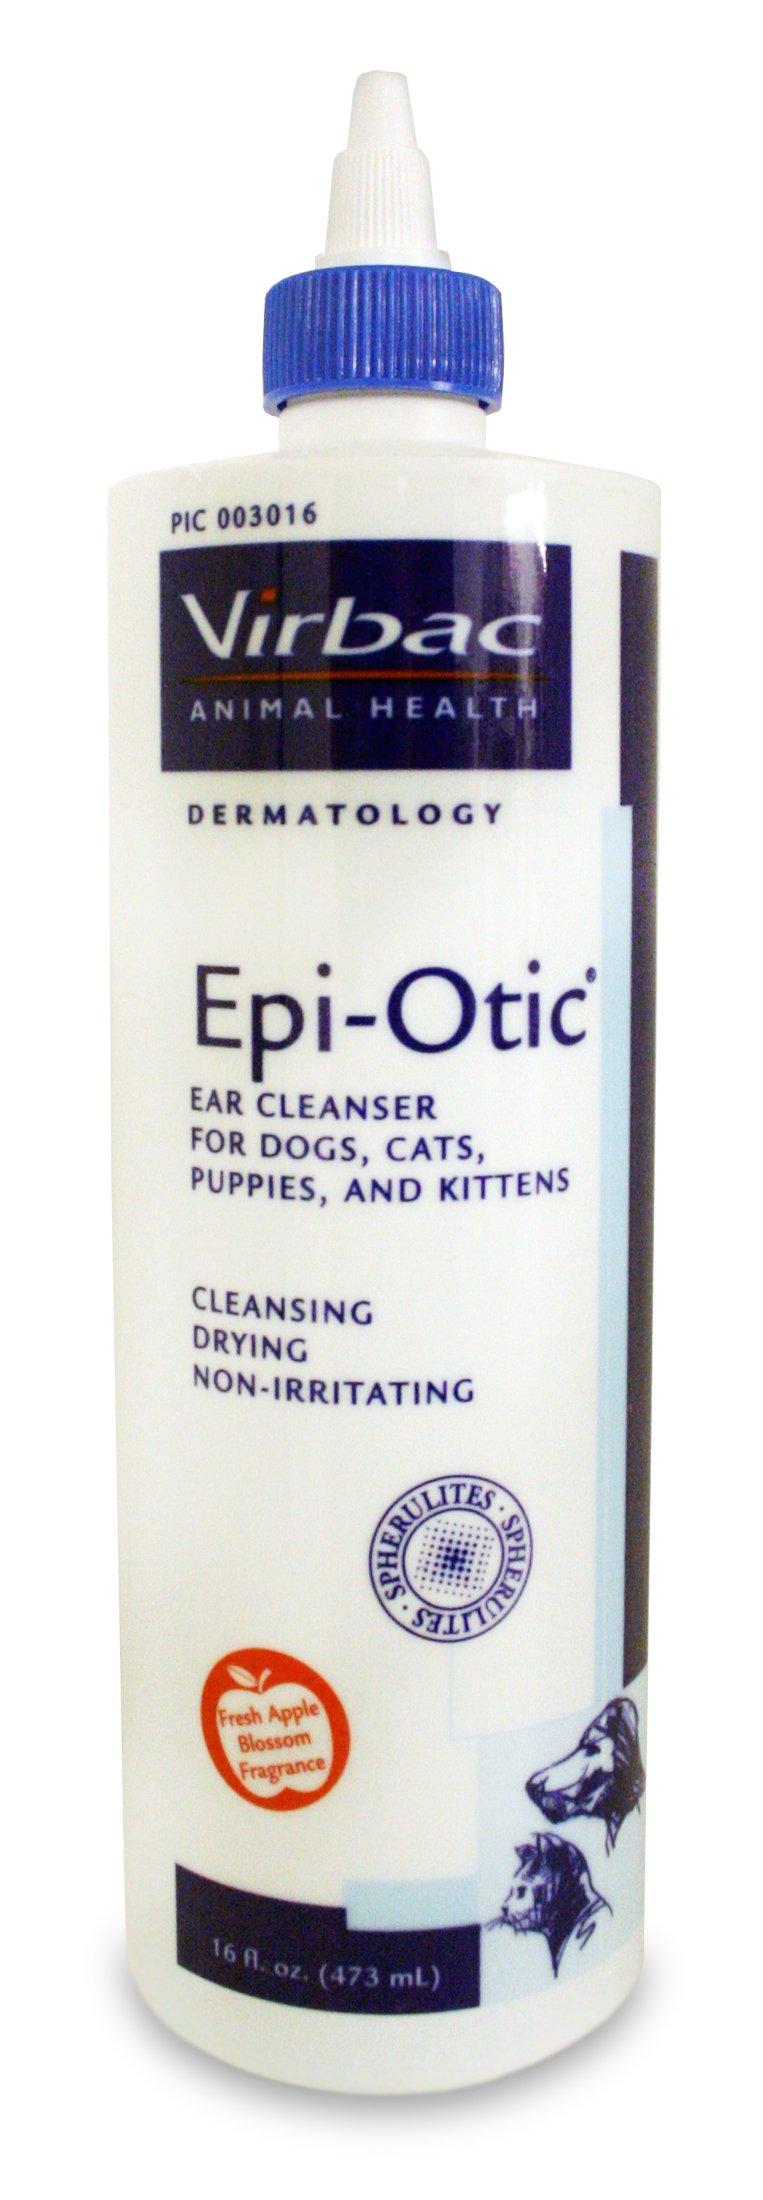 Virbac Epi-Otic Ear Cleaner, 16 oz by Virbac (Image #1)